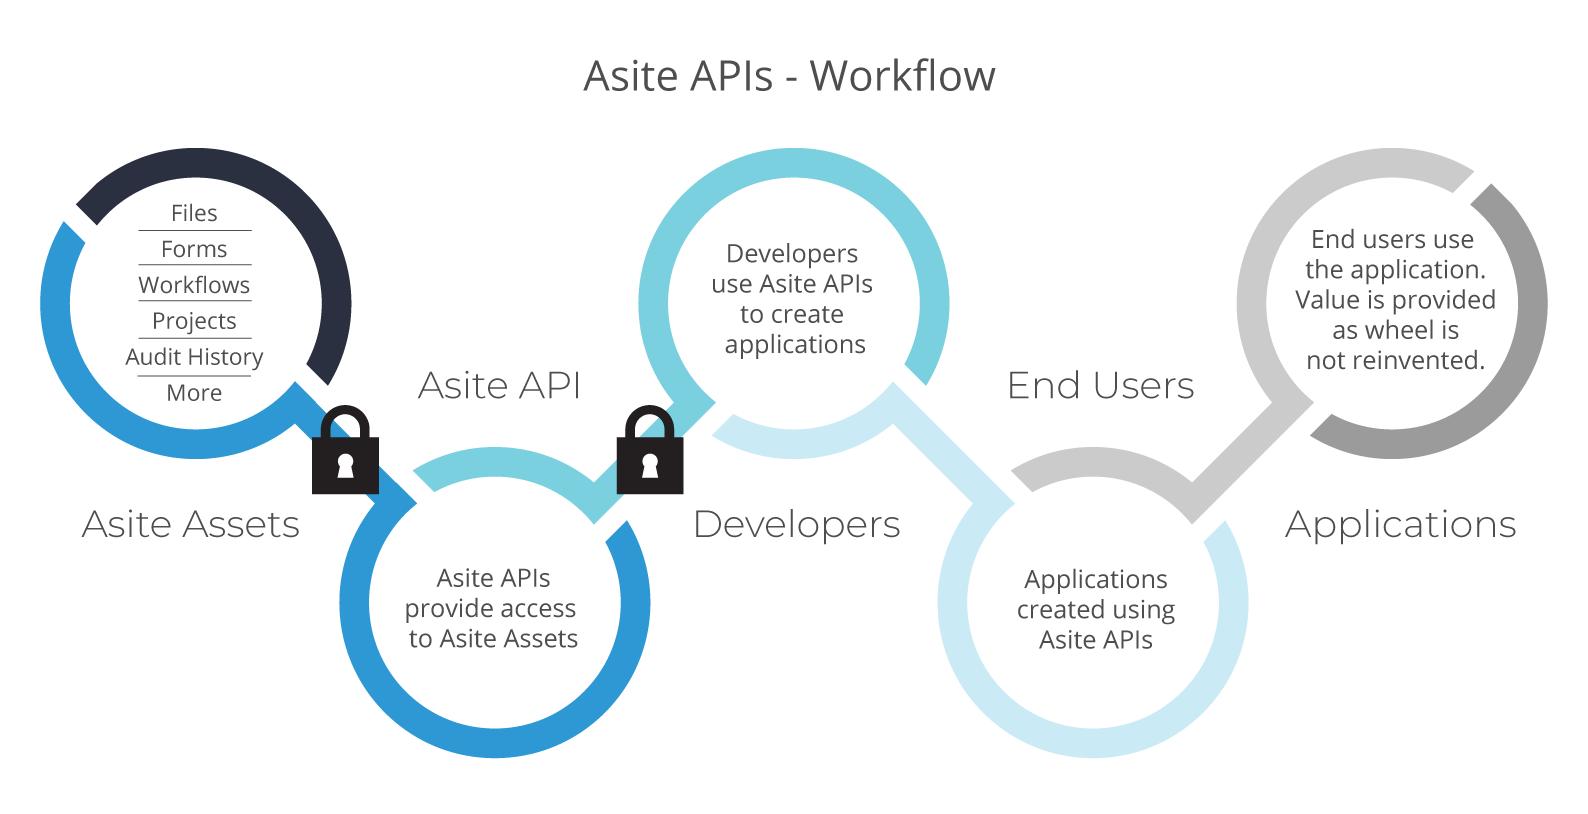 Asite-APIs-Workflow-1